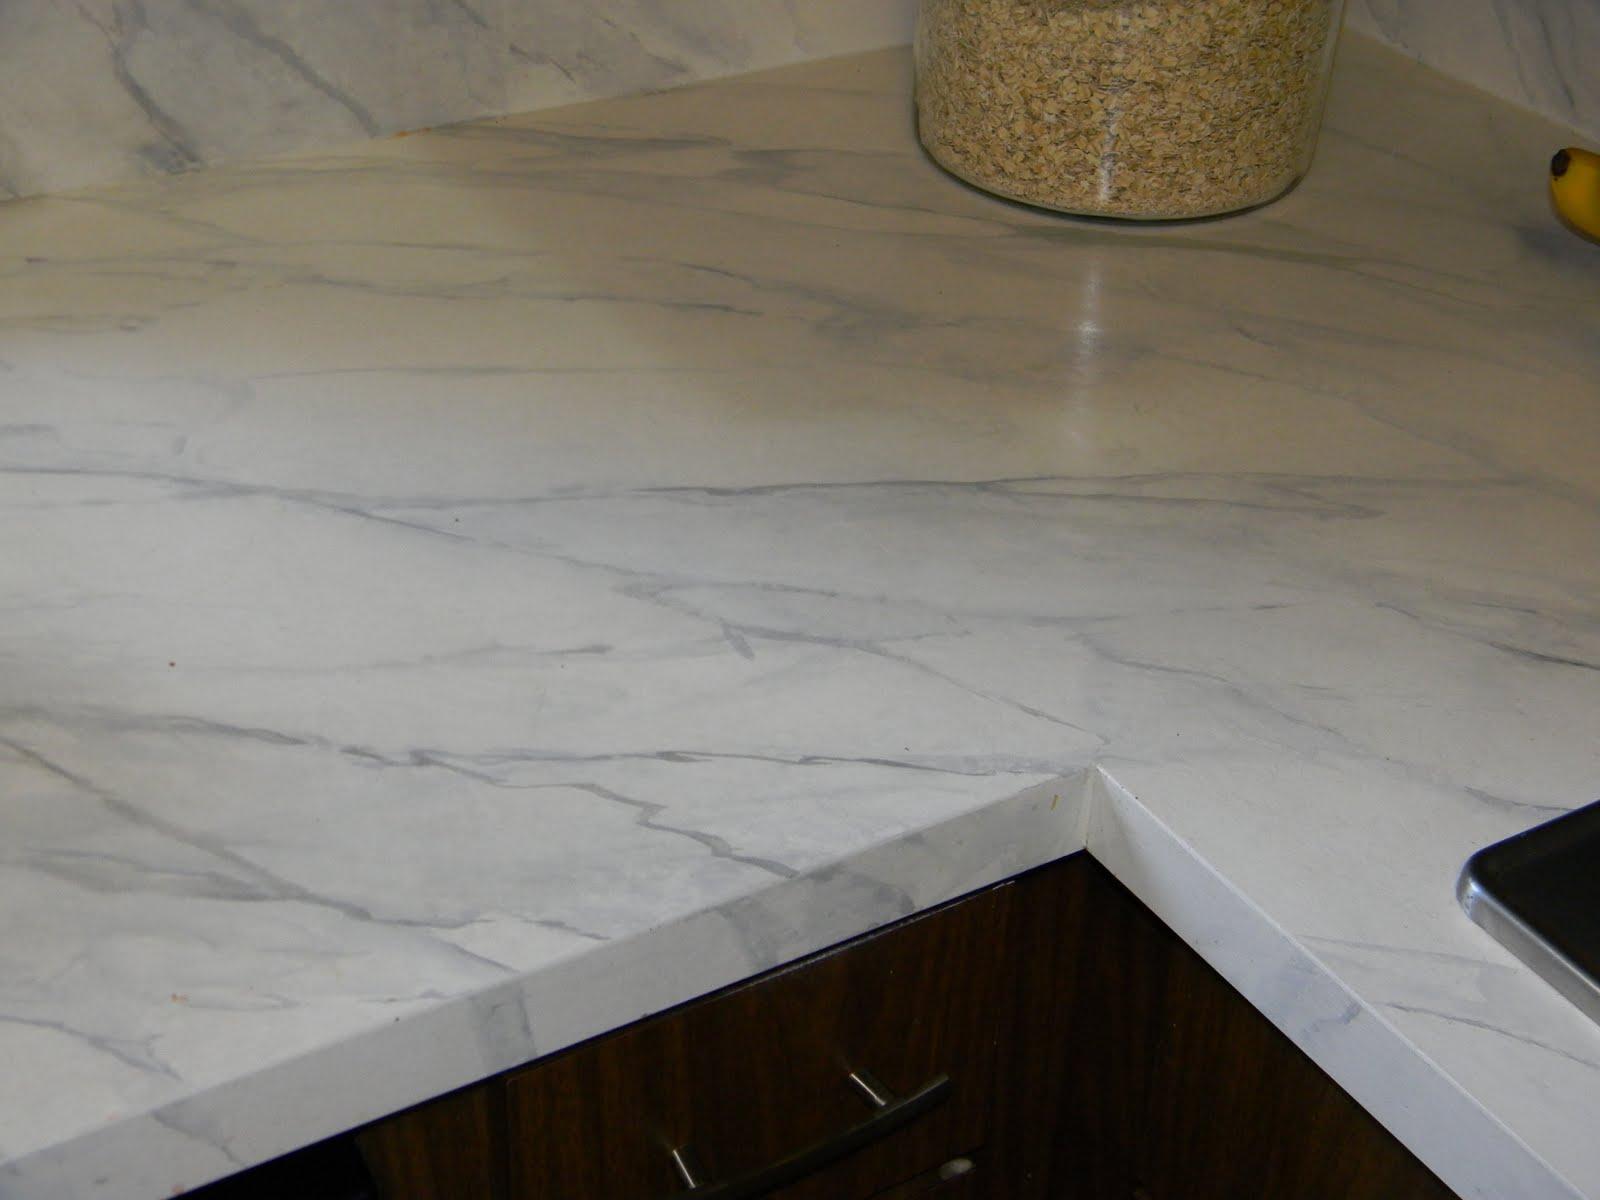 Gorgeous Shiny Things How To Hy Hour Faux Carrara Marble Ikea. Ikea Adel  White. Countertops Ikea Laminate Kitchen ...